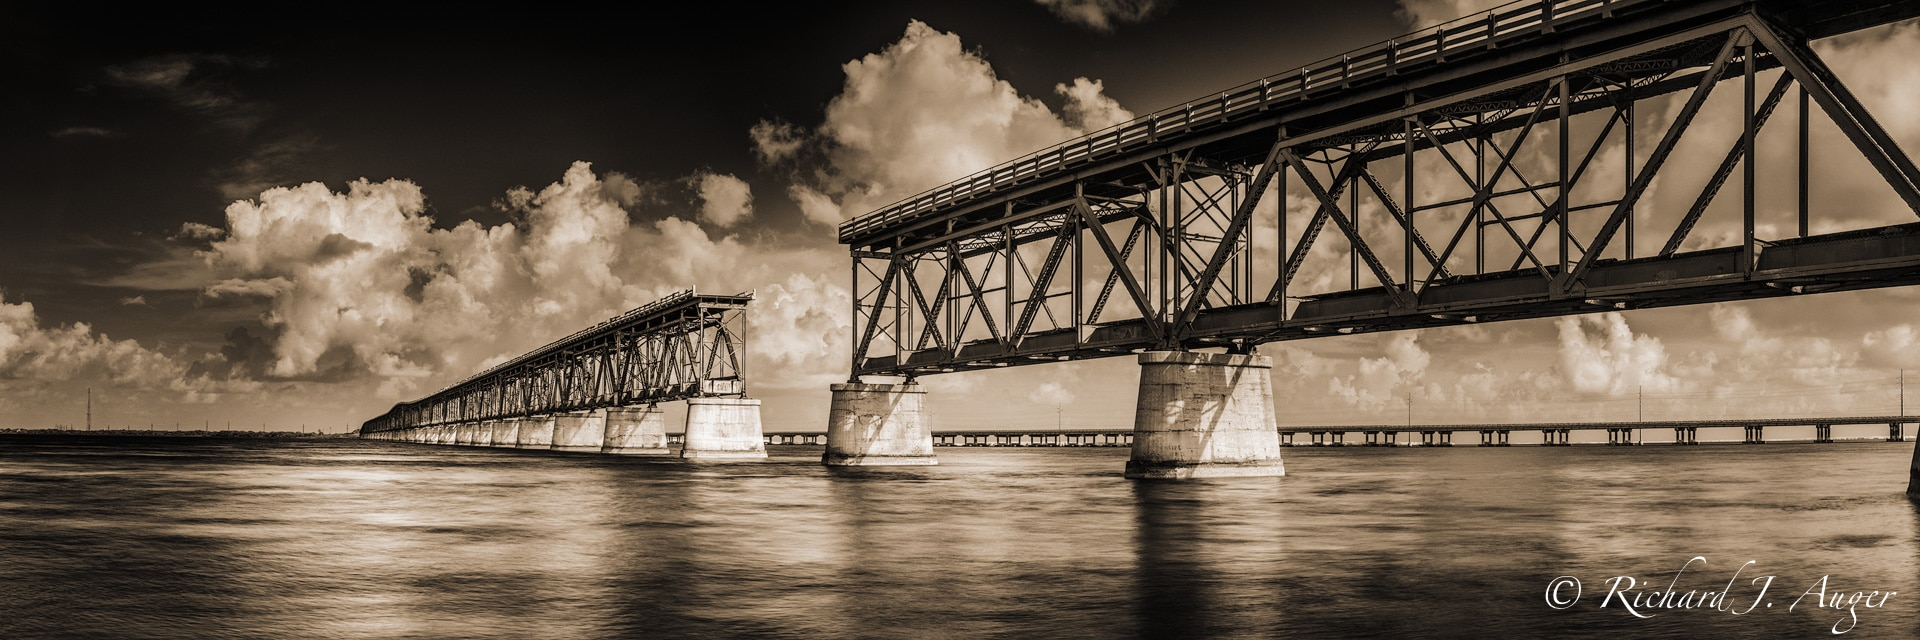 Bahia Honda Bridge, Bahia Honda State Park, Florida Keys, Historic, Water, Ocean, Sepia, Landscape, photographer, photograph, sepia tone, black and white, panorama